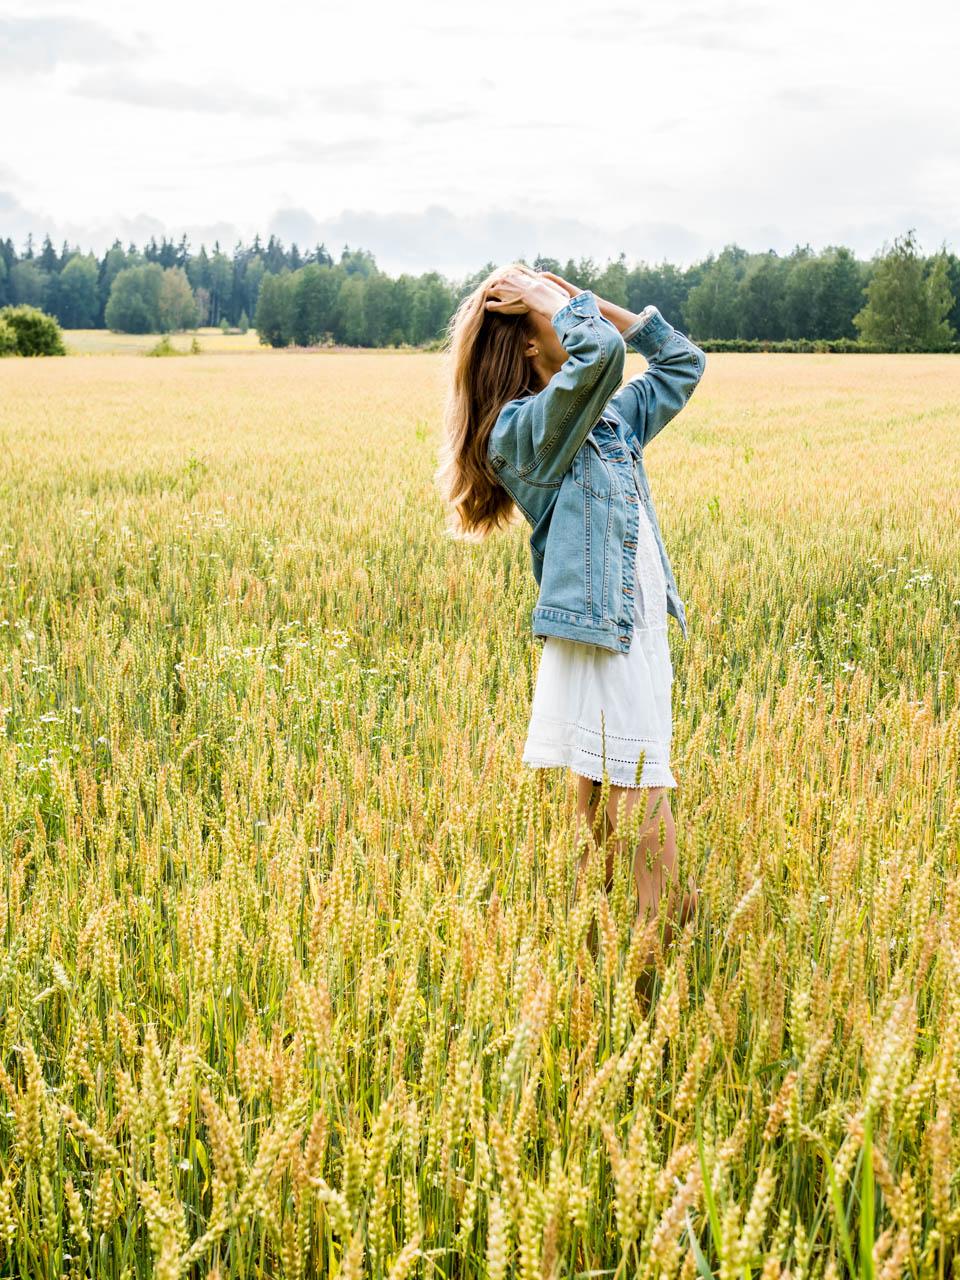 fashion-photography-girl-on-a-field-summer-dress-denim-jacket